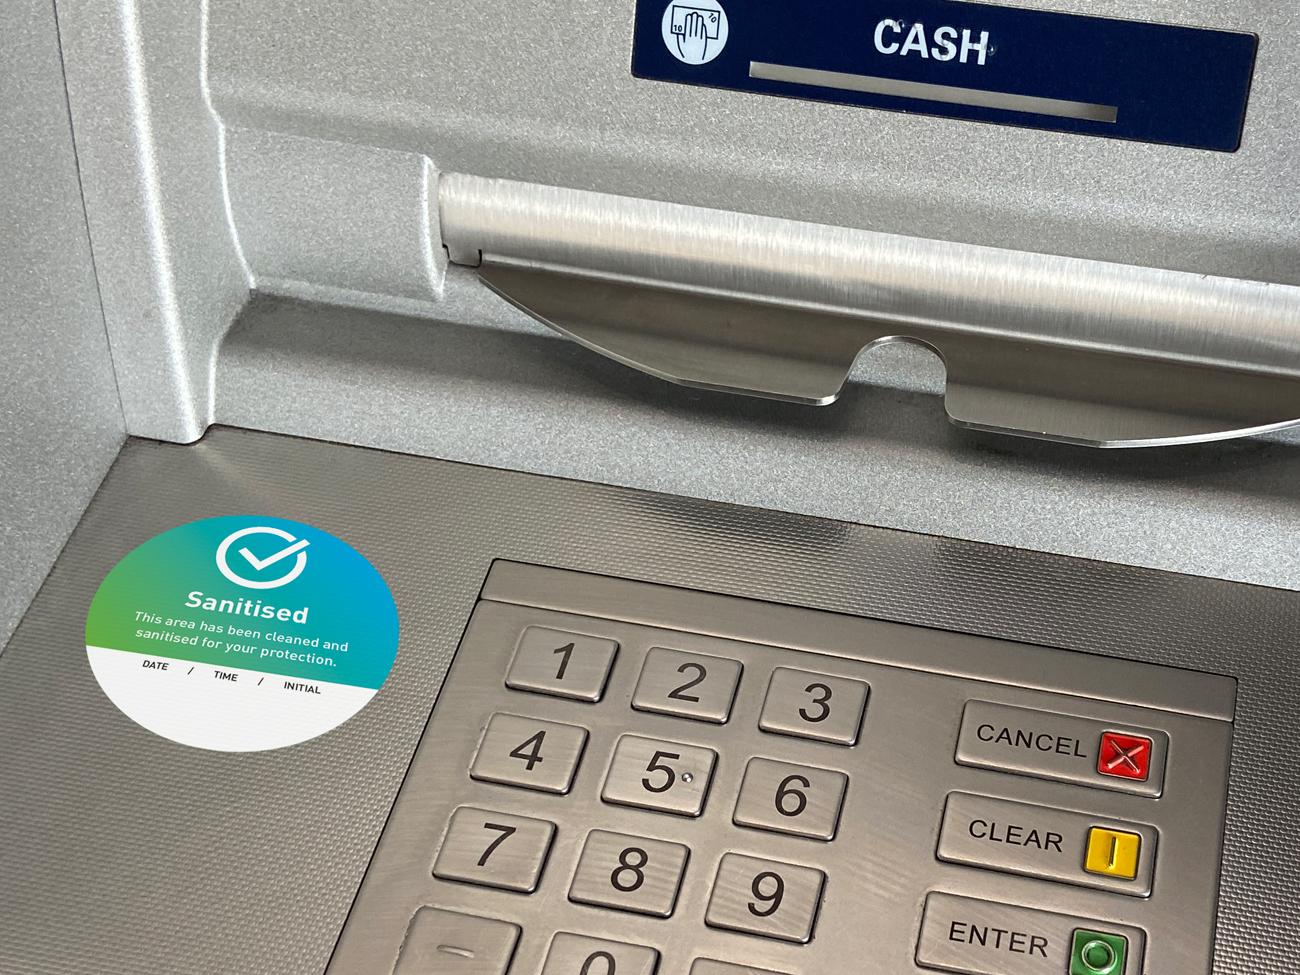 Covid Clean cashpoint atm sticker